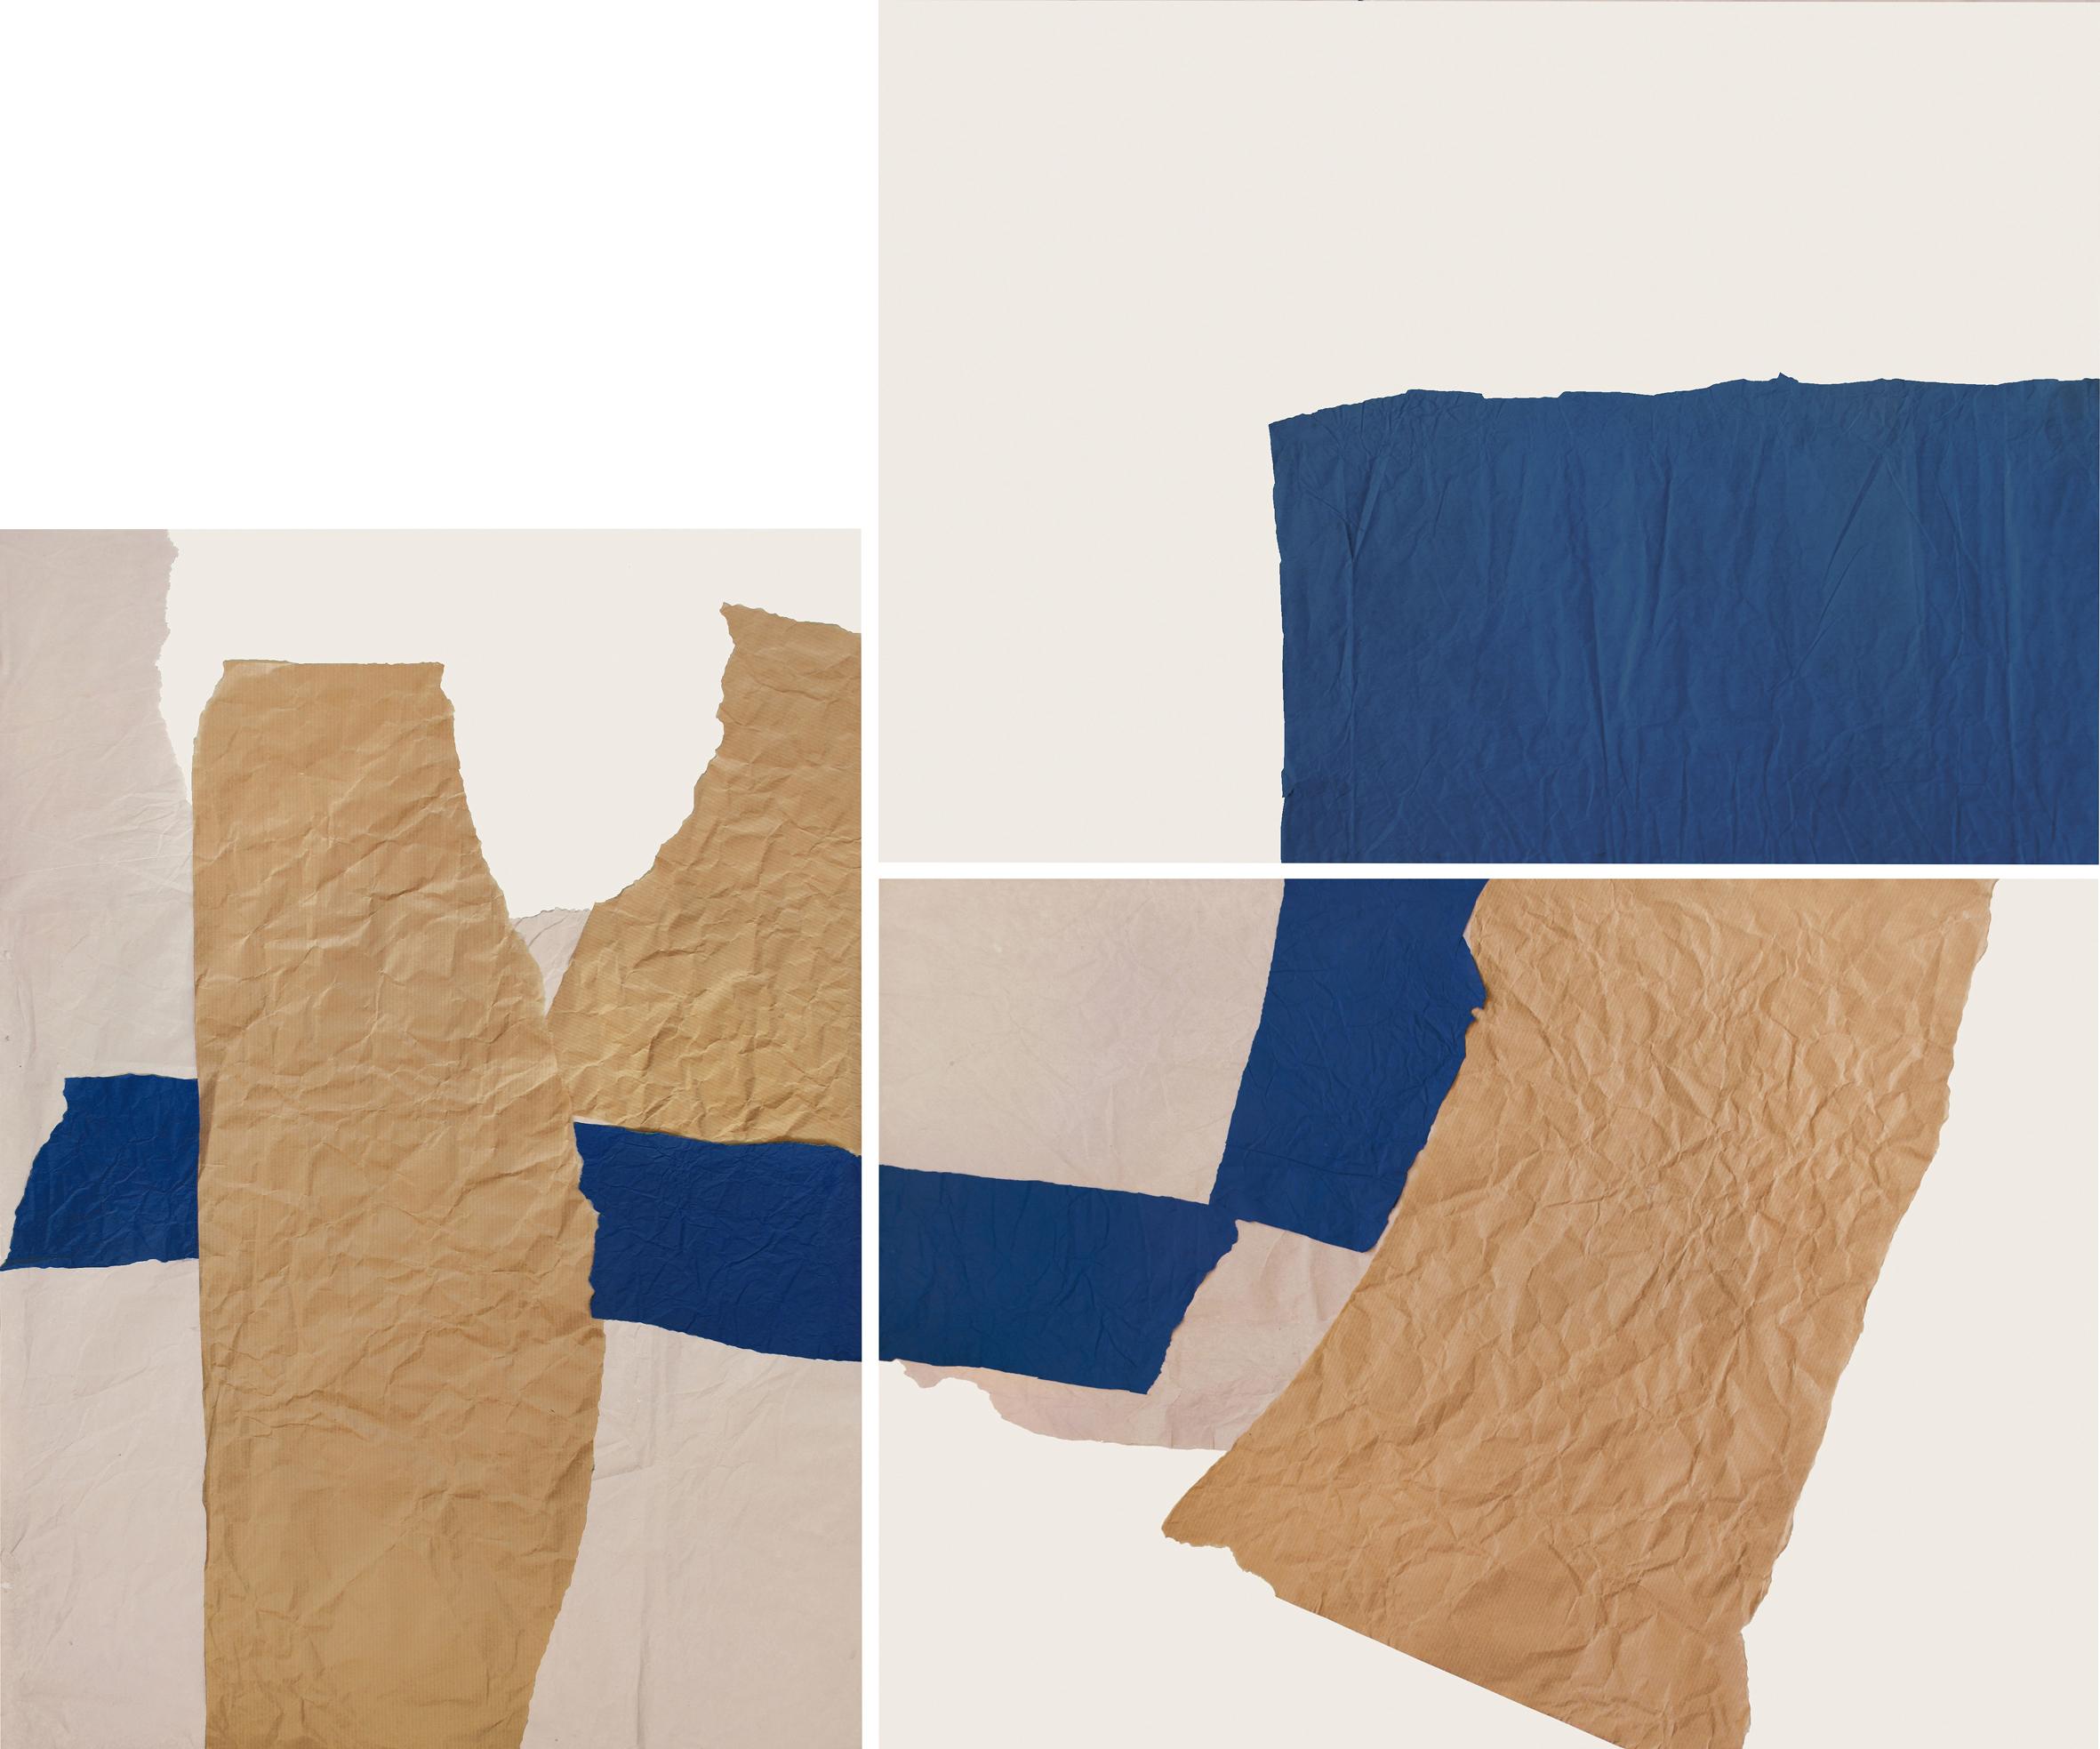 3. motiv (3 teilig), je 70 x 50 cm, versch. papiere